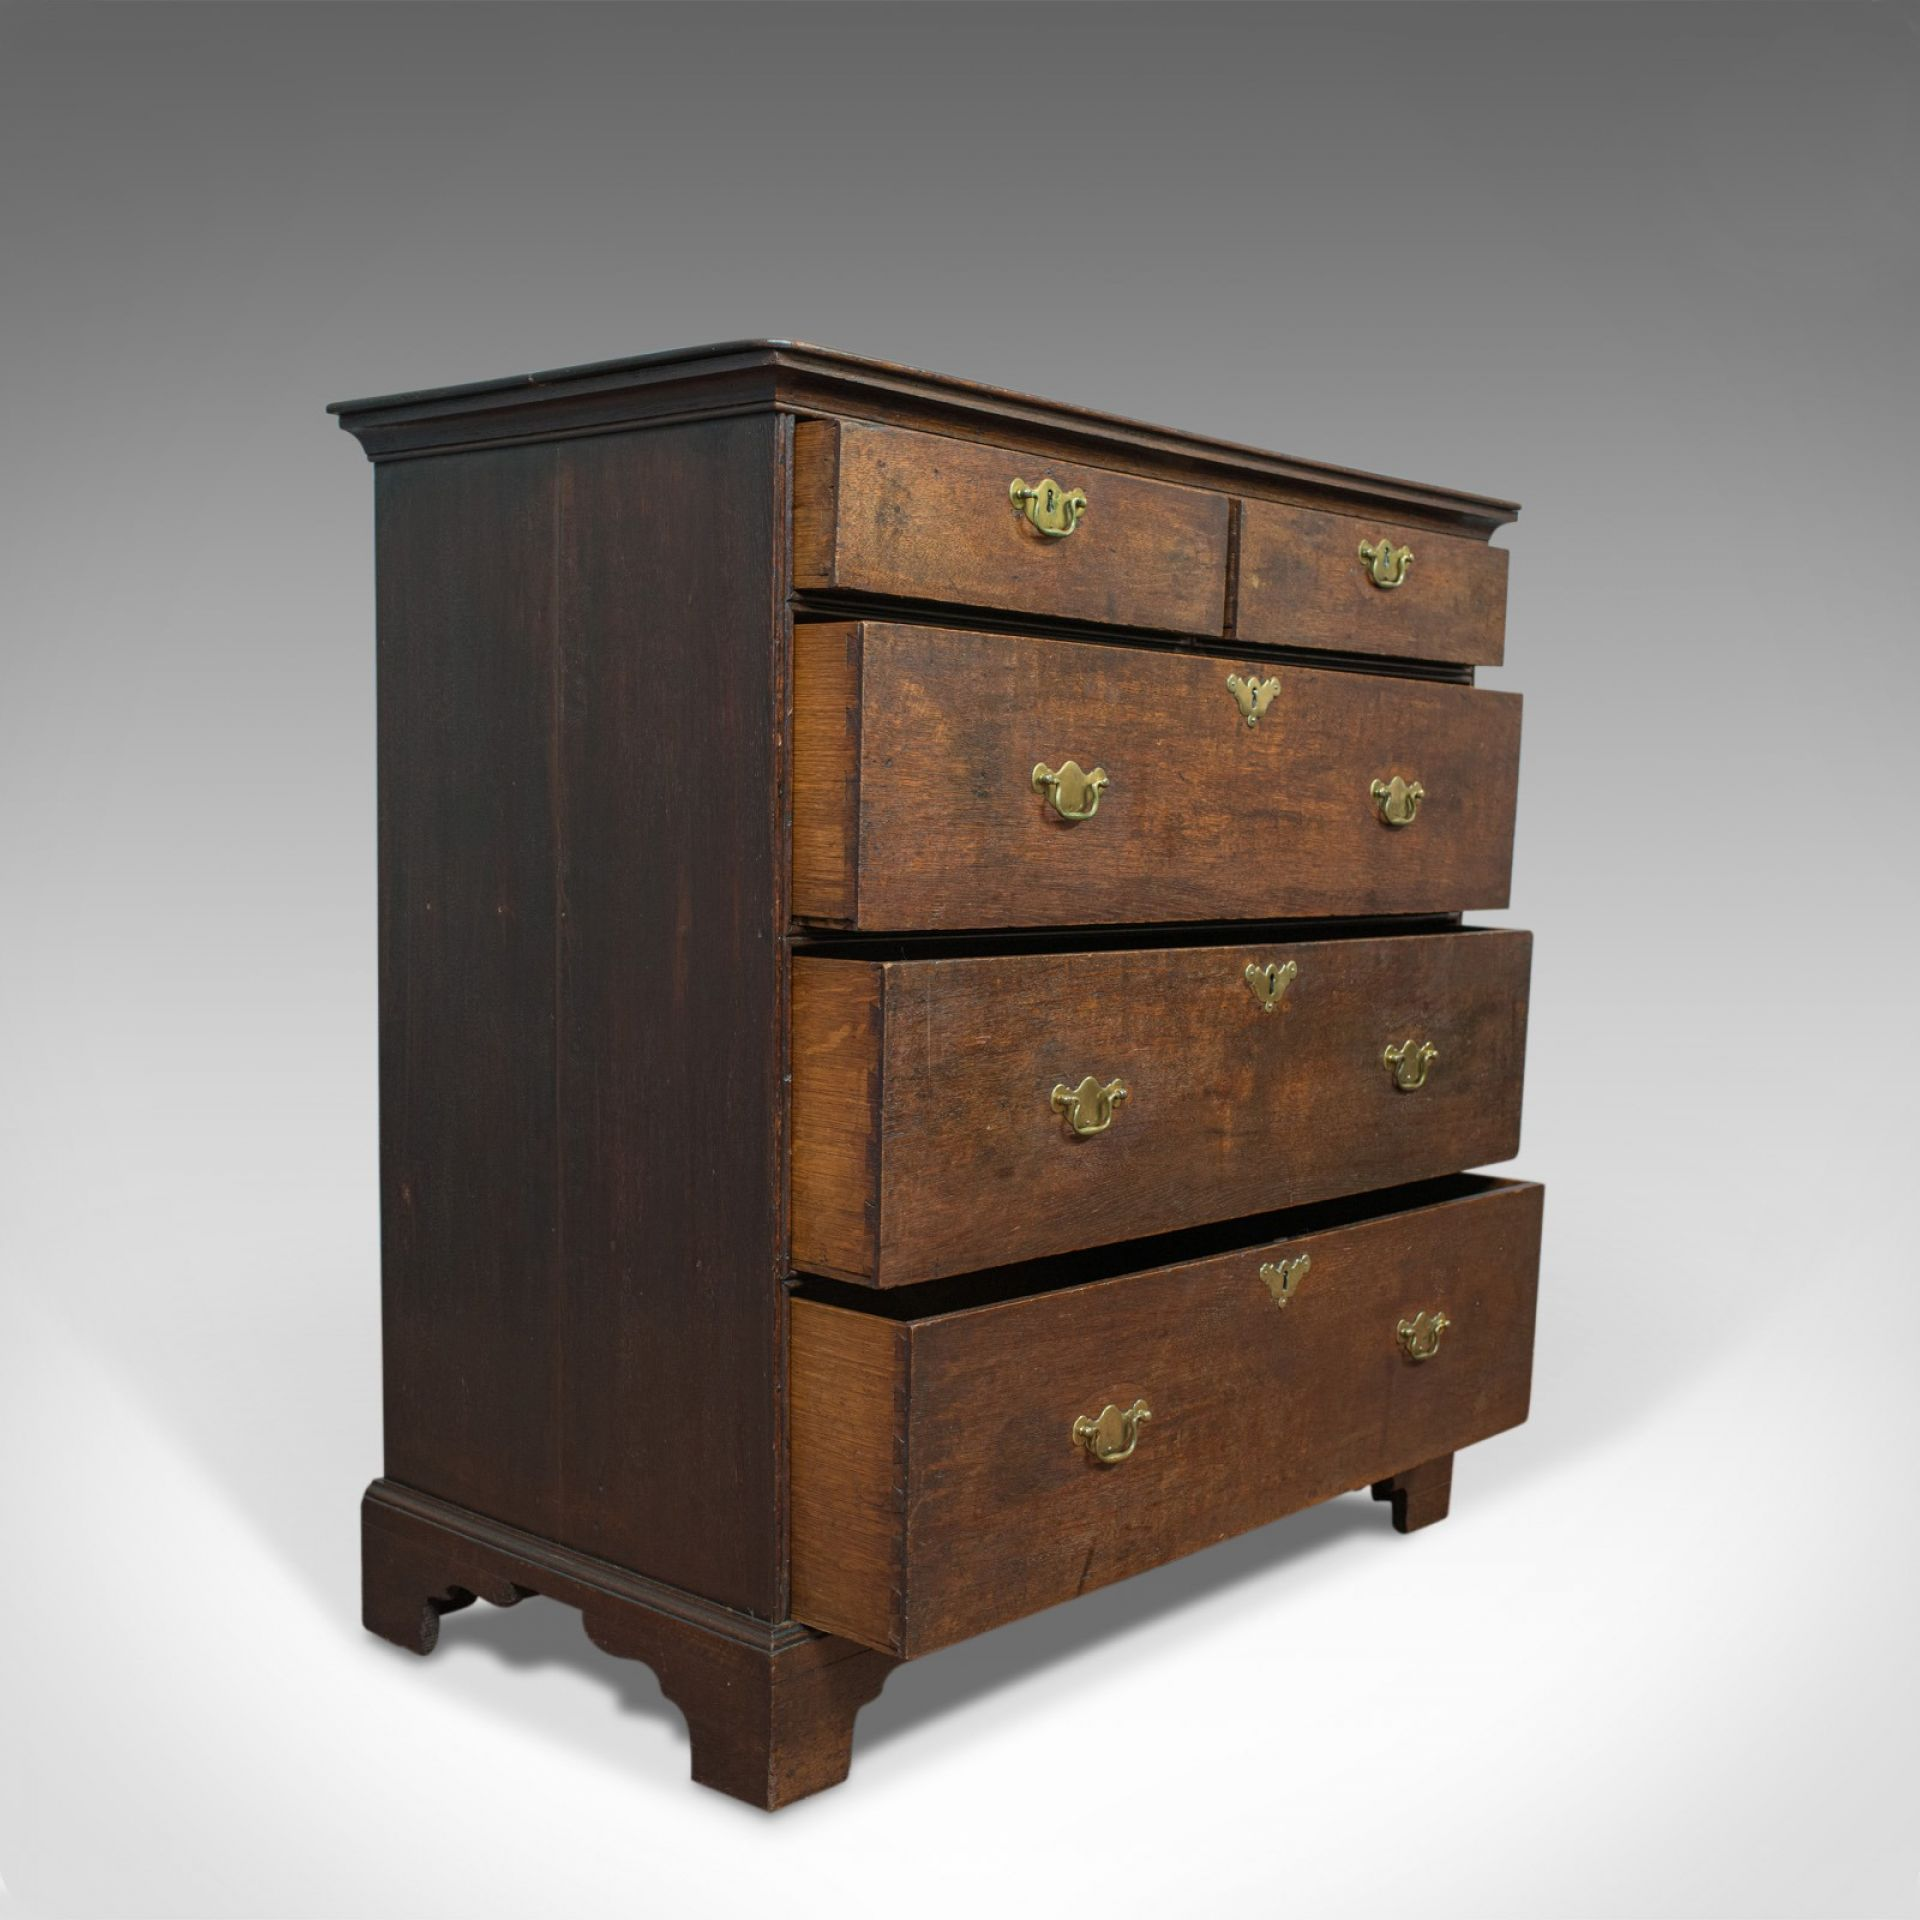 Antique Chest of Drawers, English, Oak, Bedroom, Tallboy, Georgian, Circa 1790